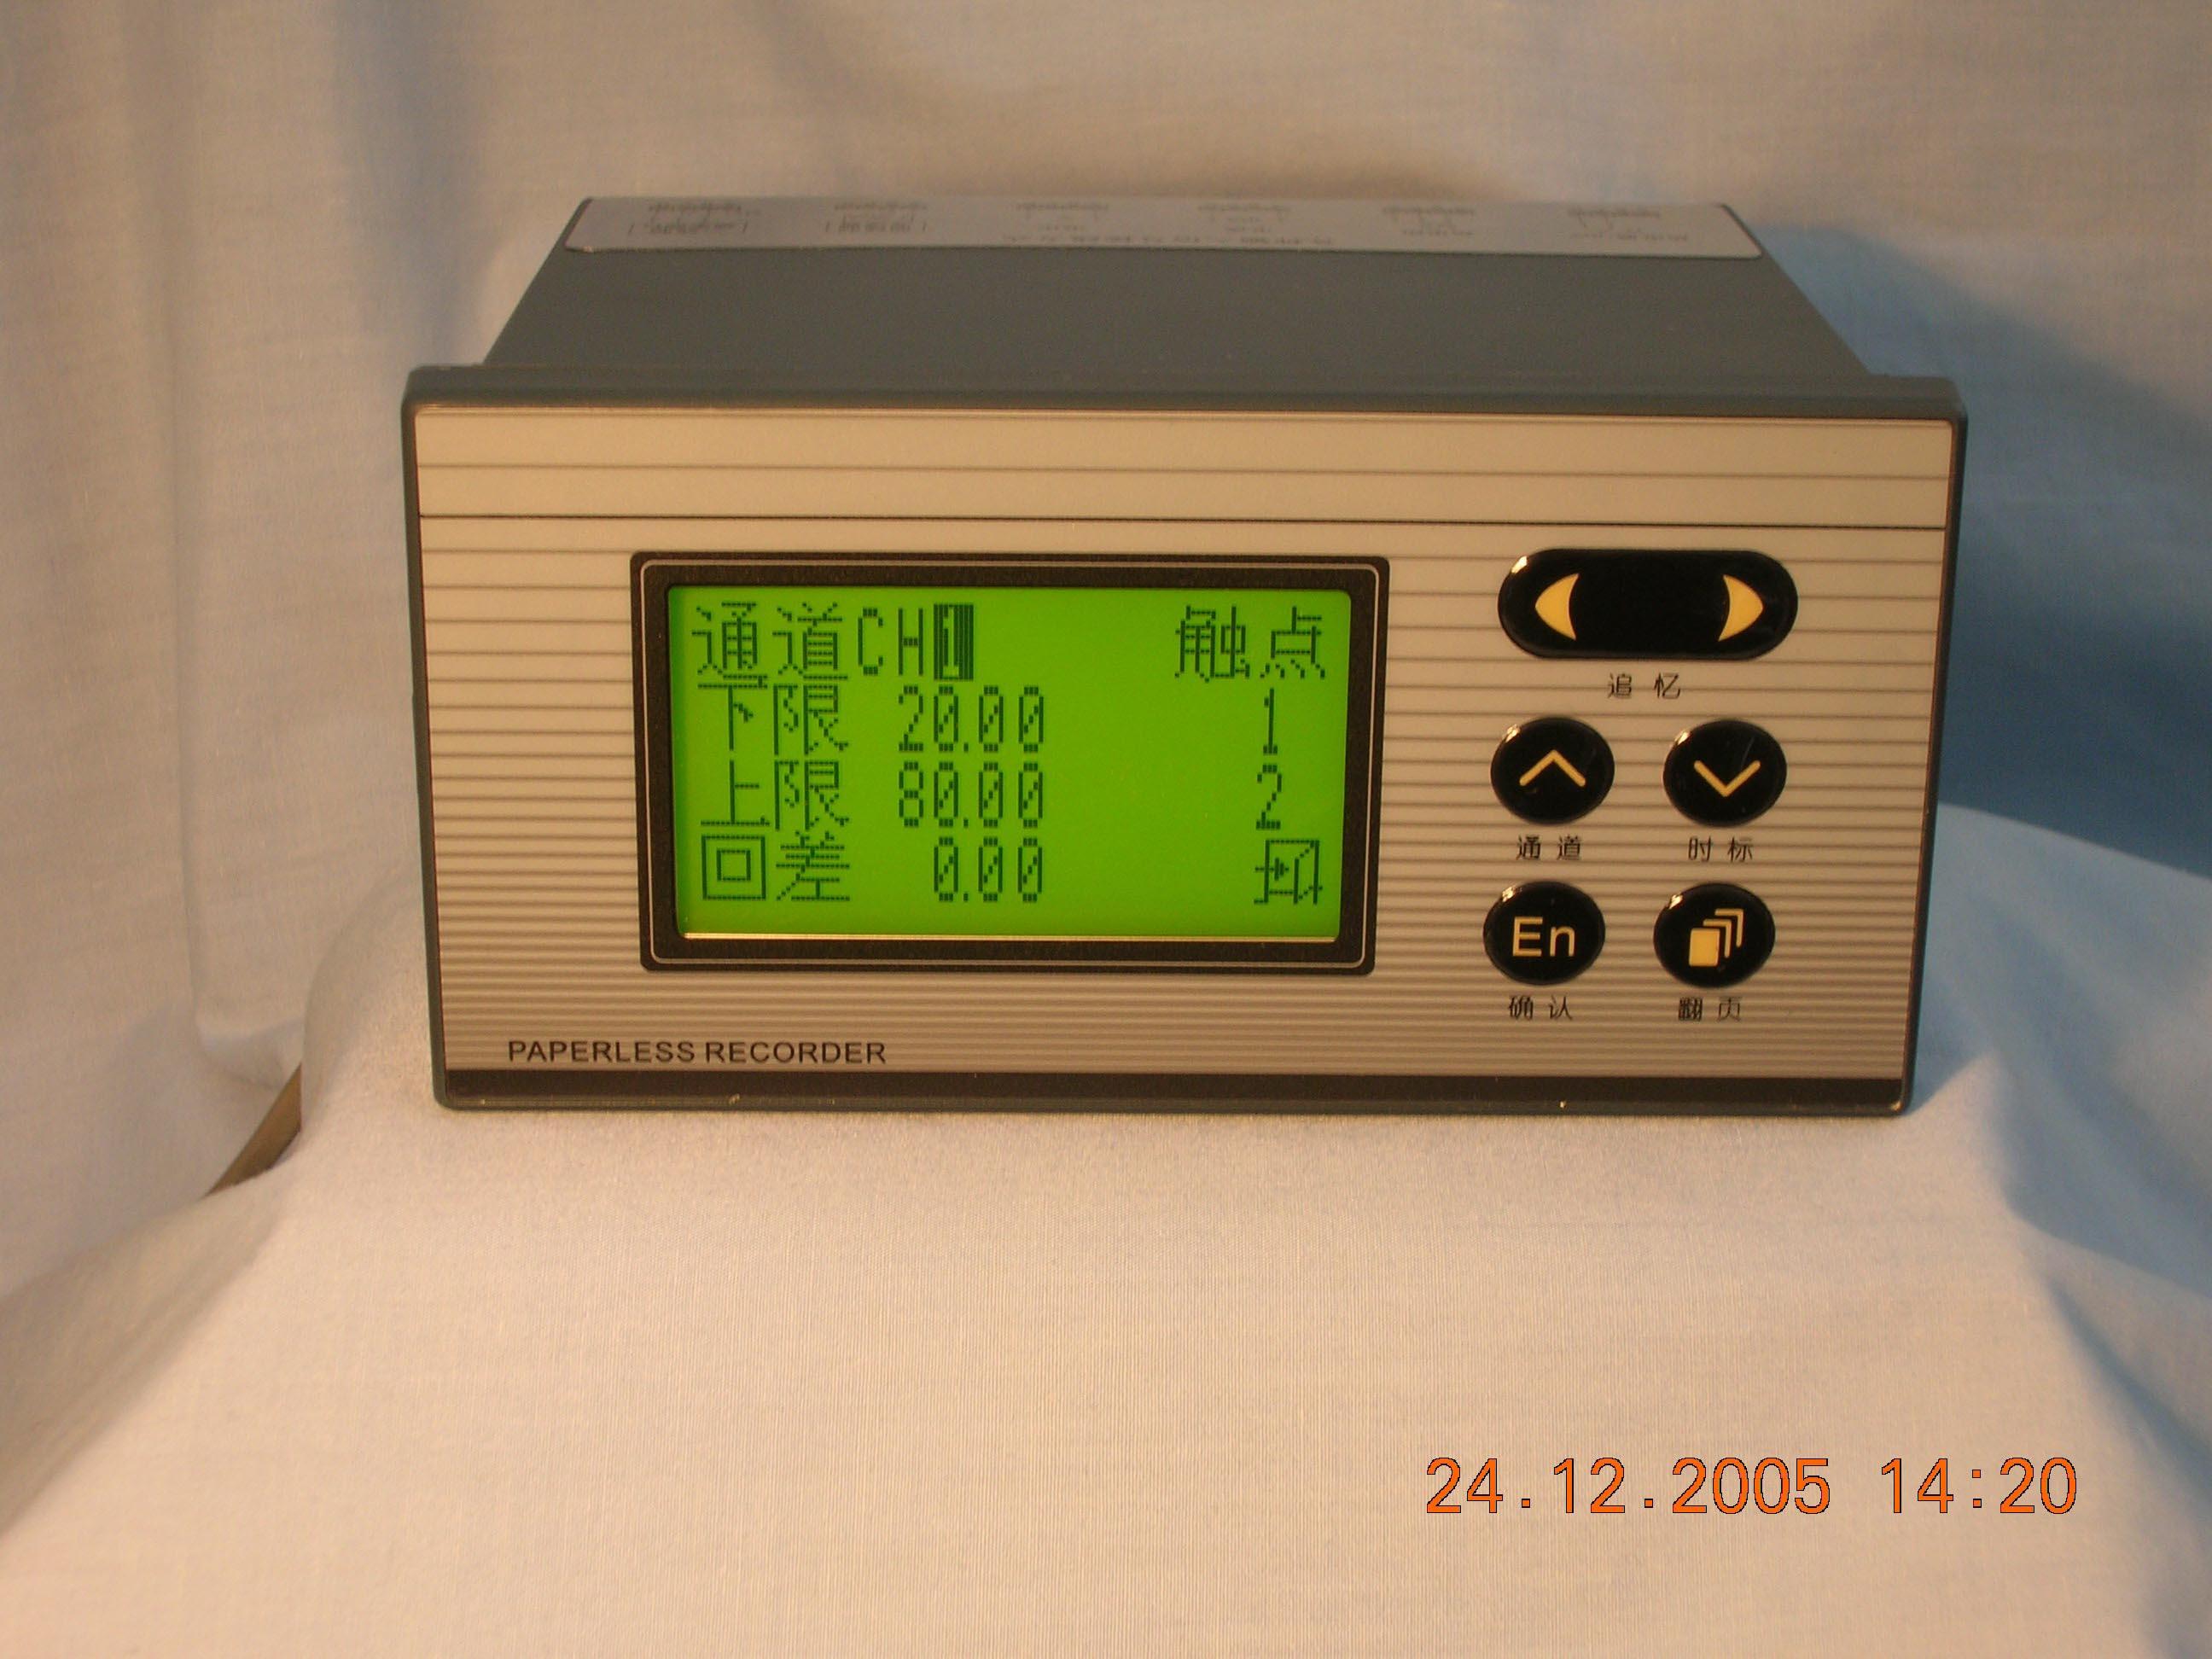 mc-200-003.jpg